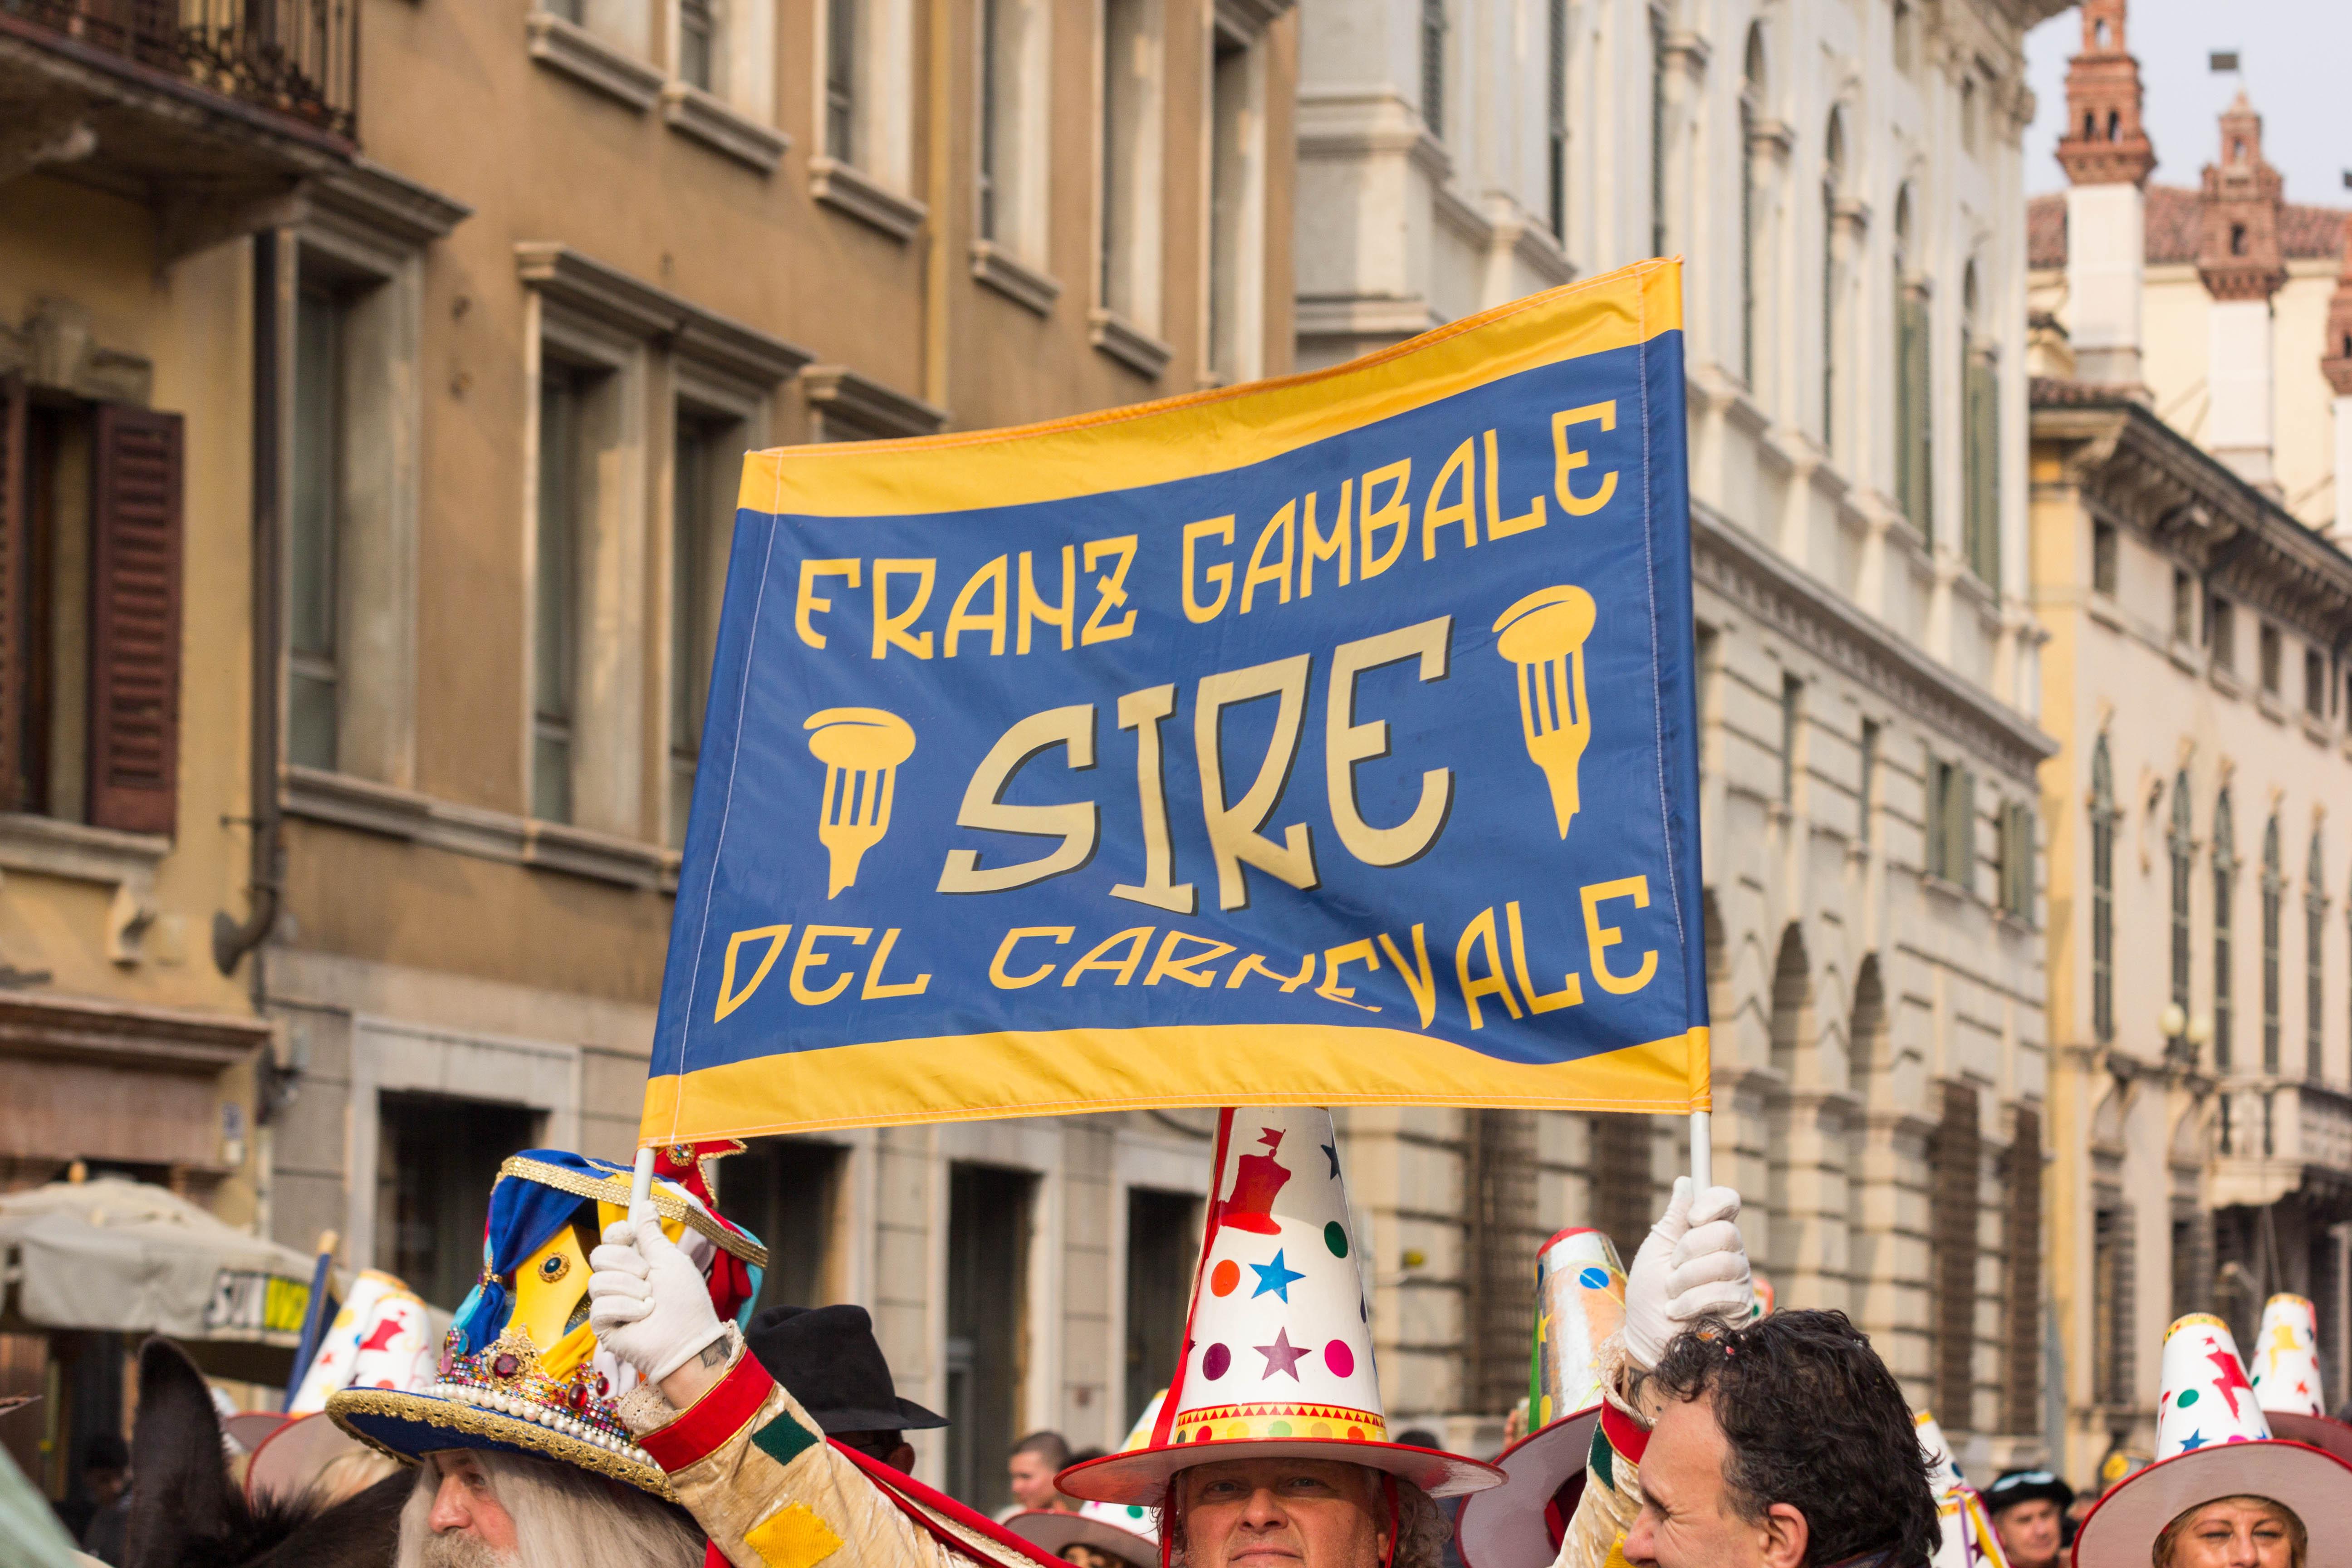 Carnevale Verona 2019